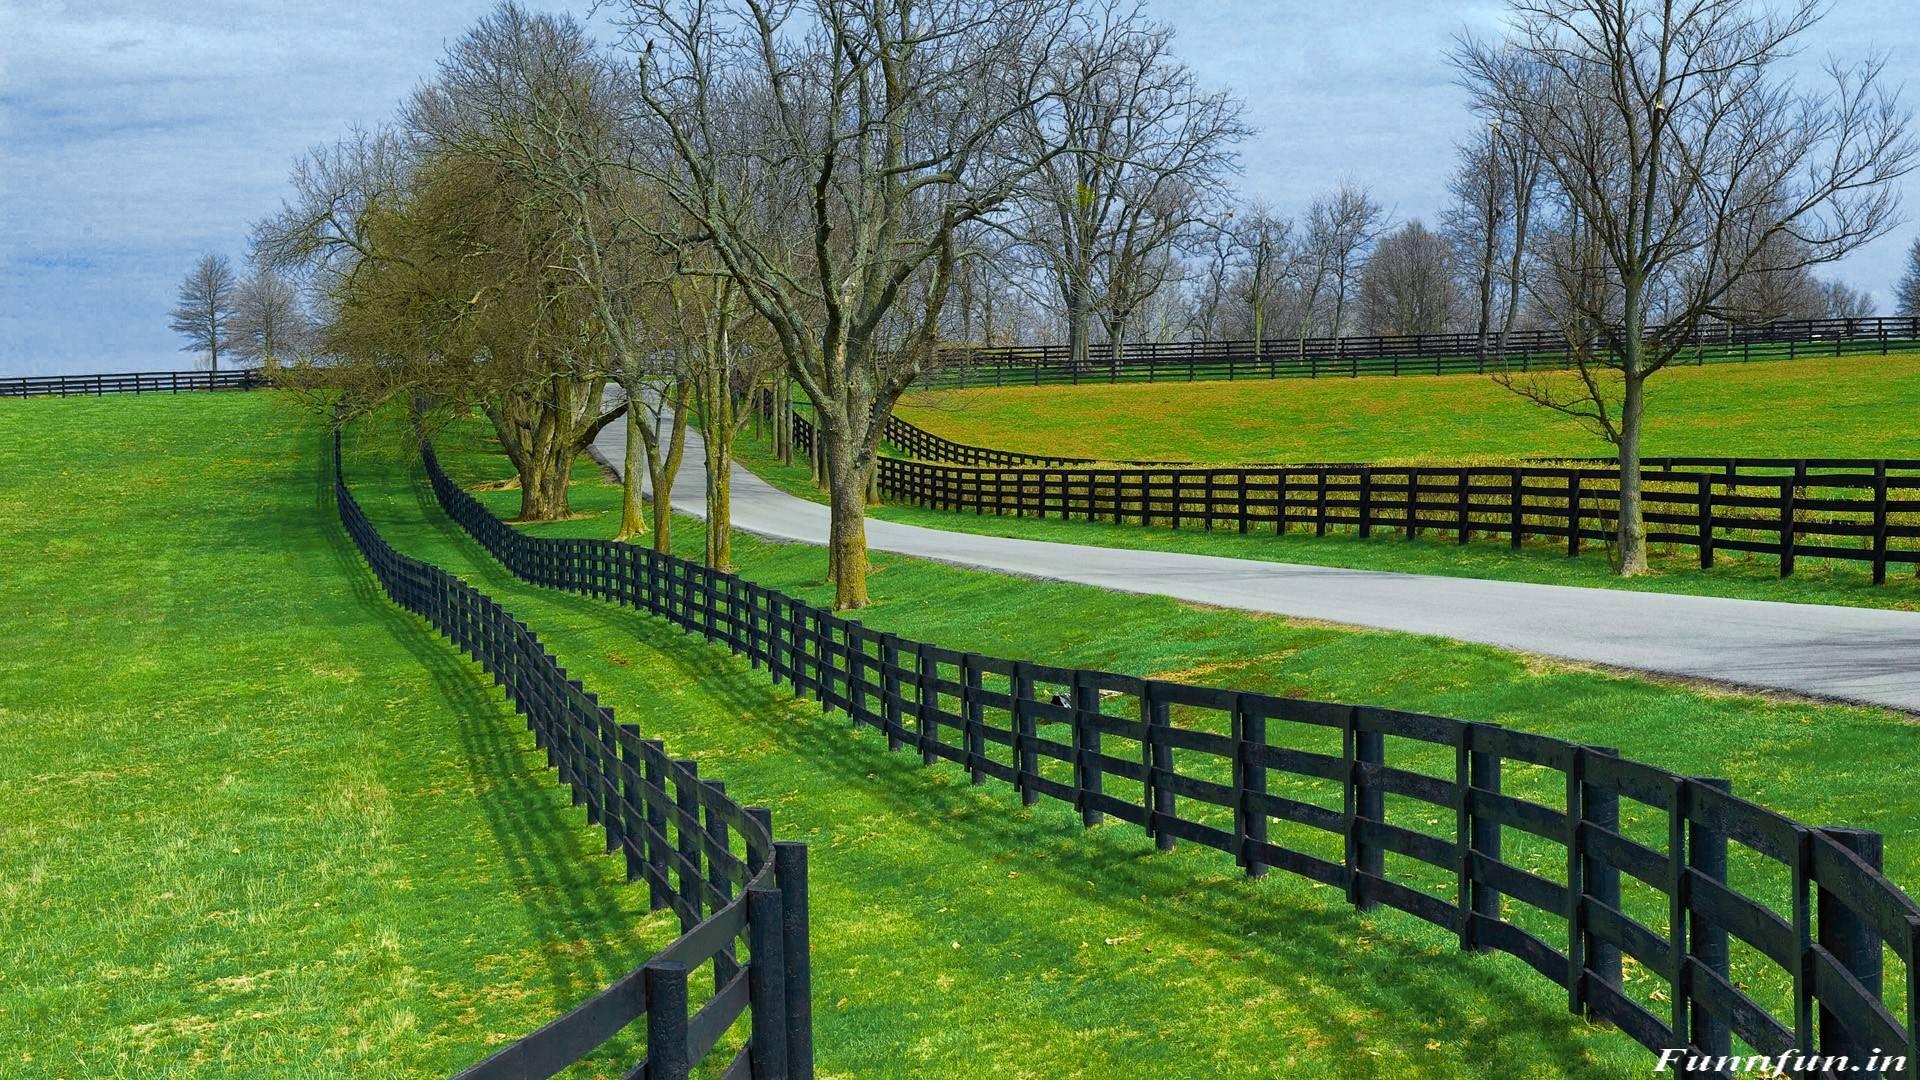 nature wallpaper full hd,green,natural landscape,fence,pasture,grass